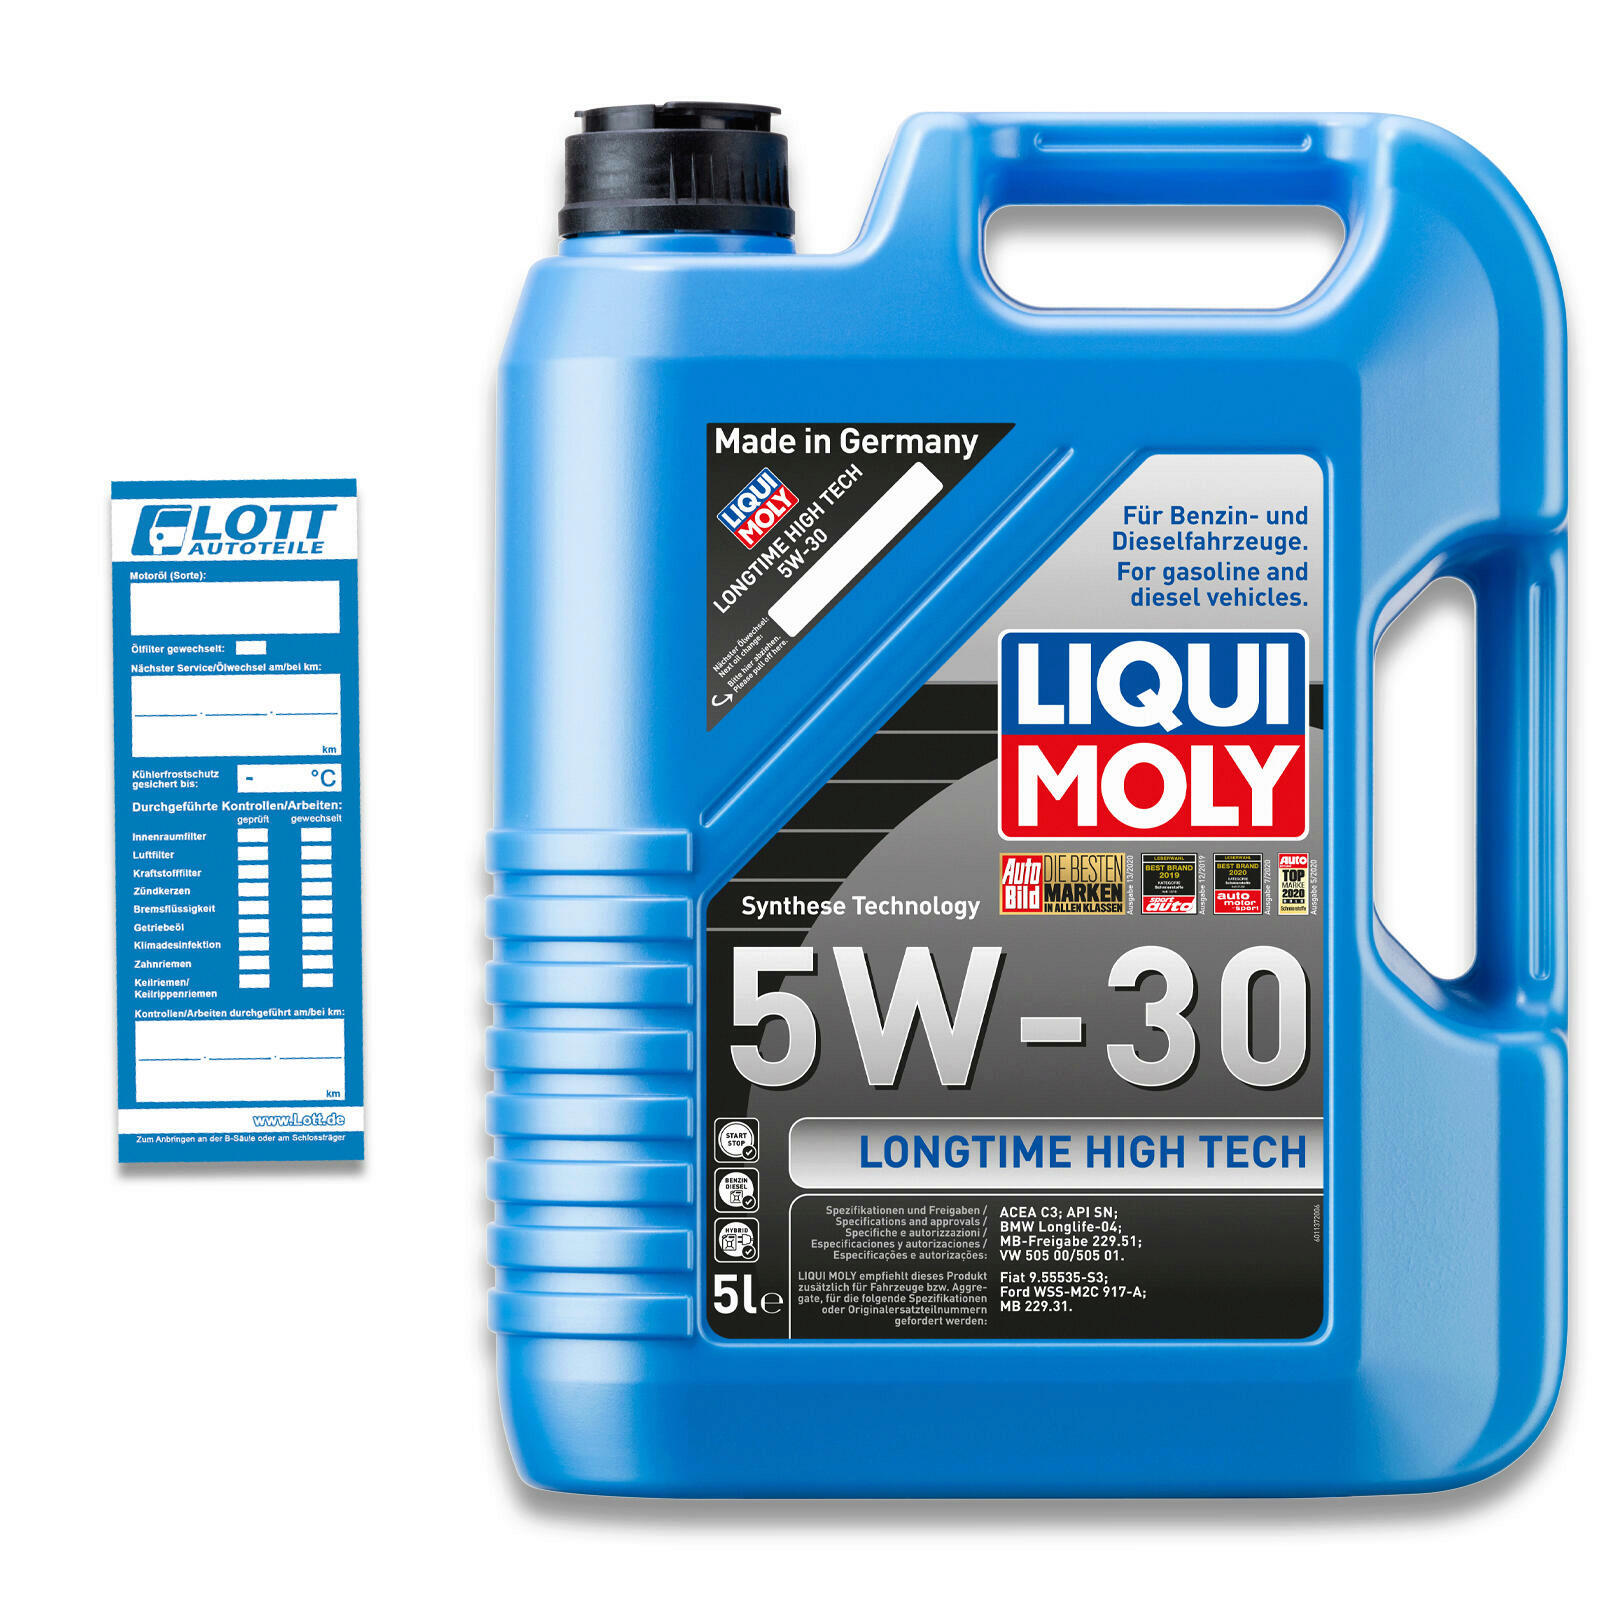 Liqui Moly Leichtlaufmotorenöl Longtime High Tech 5W-30 5L